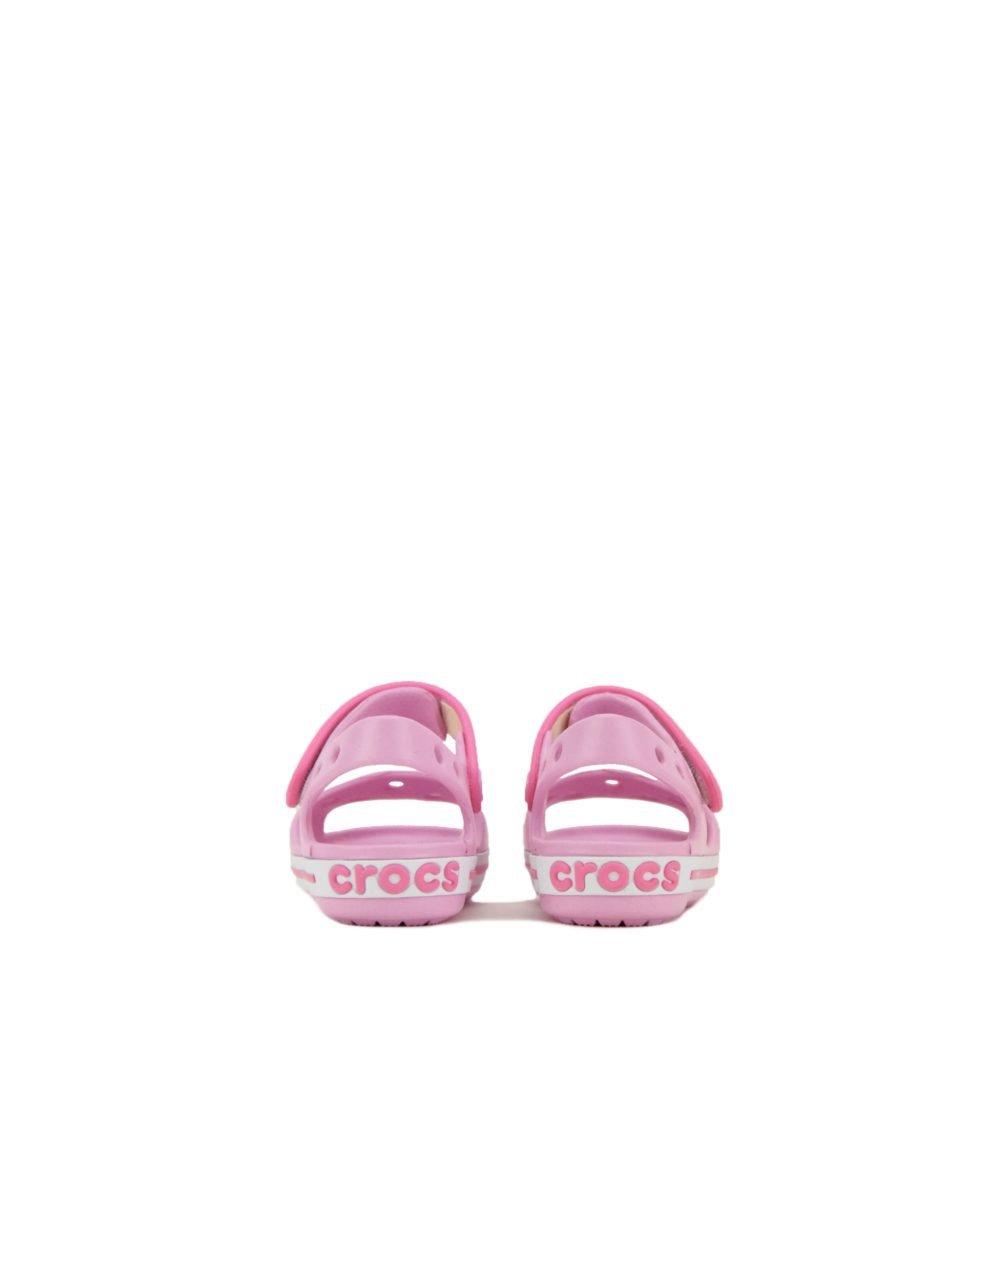 Crocs Crocband Sandal Kids (12856-6GD) Ballerina Pink